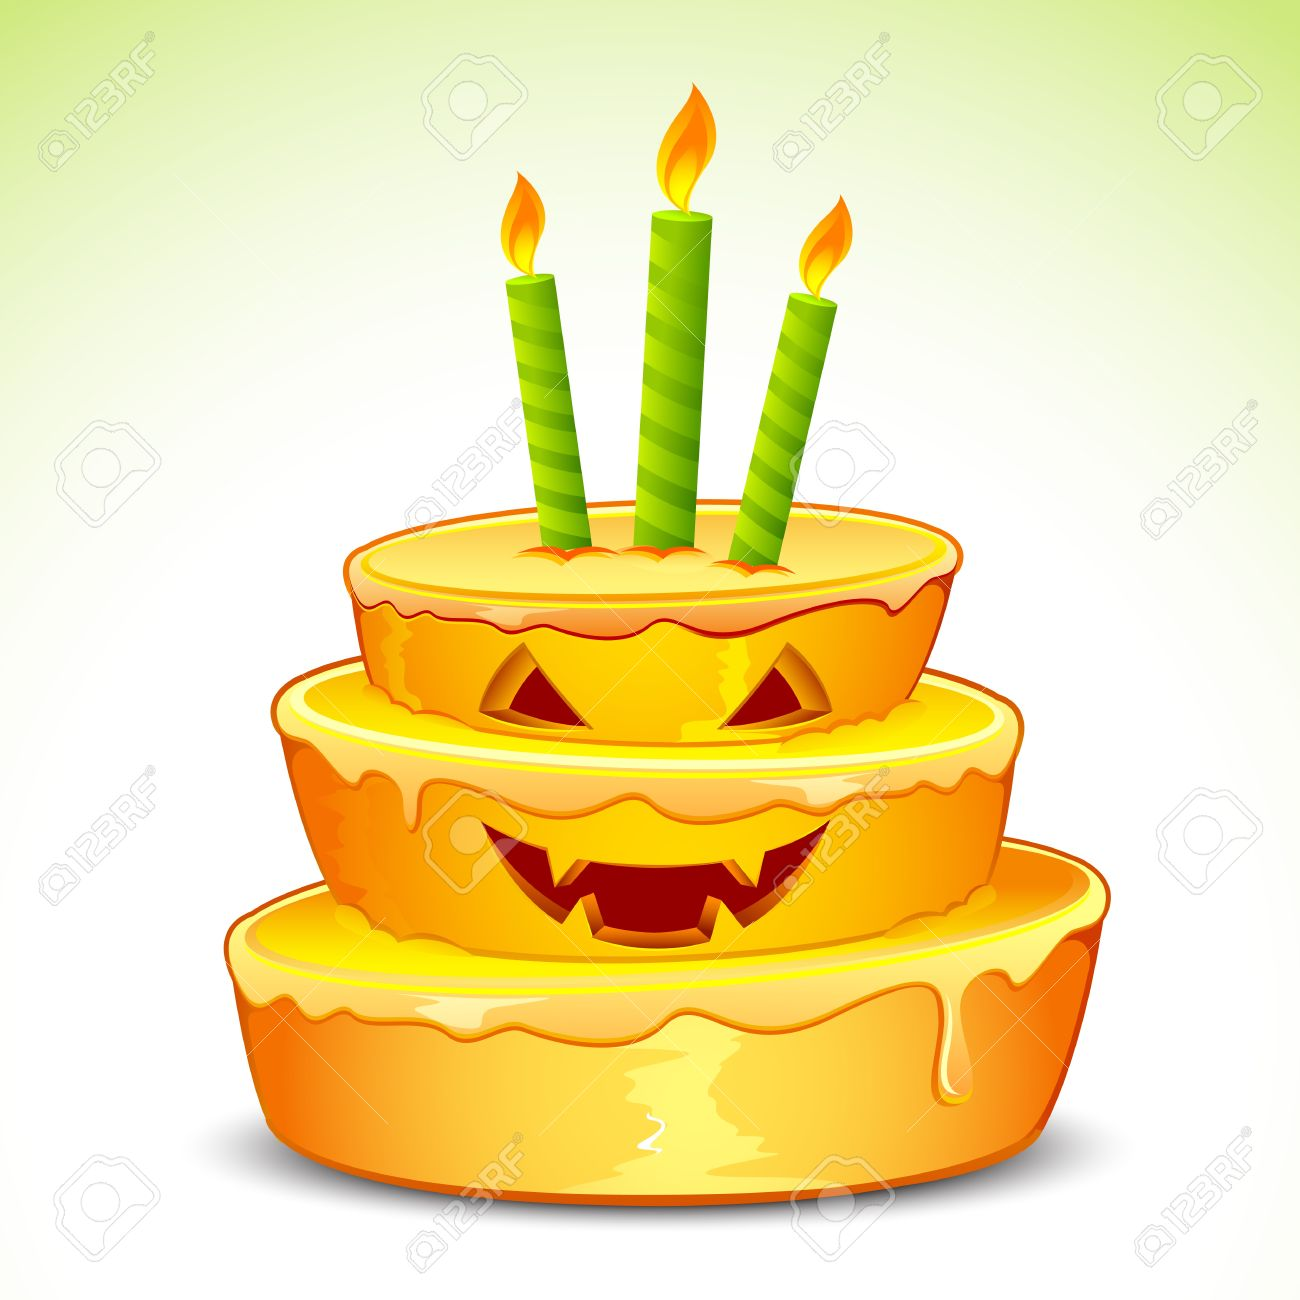 Mead halloween clip art. illustration of pumpkin cake .